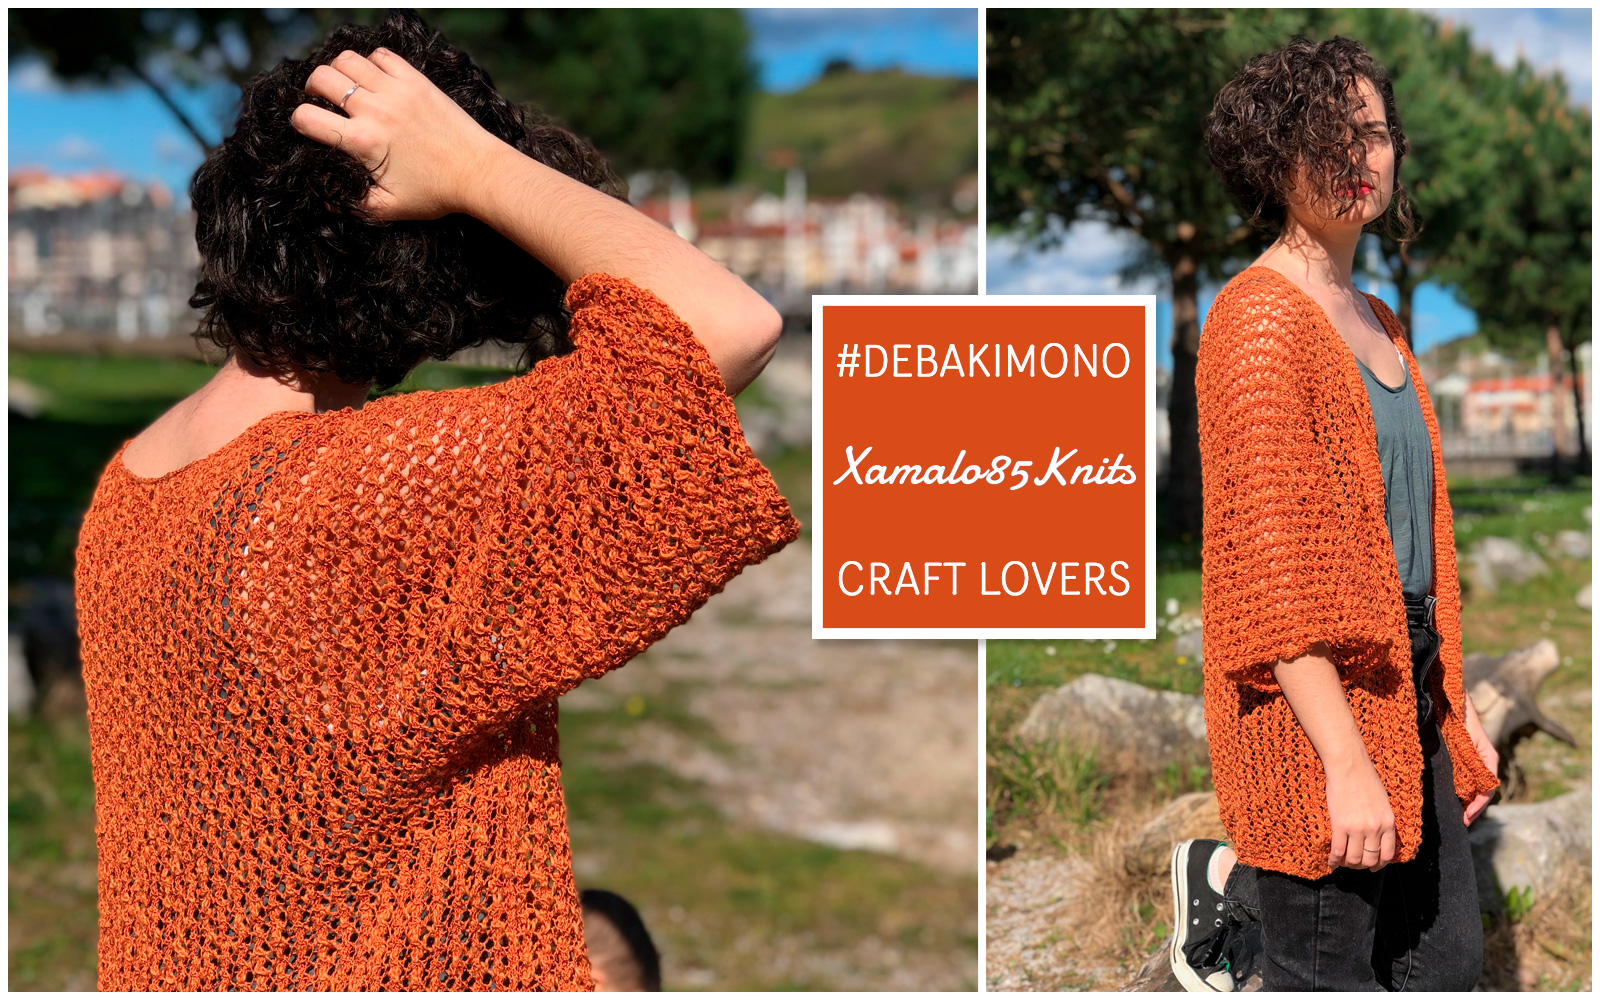 Ana Paula Rimoli Seriously Cute Crochet - Home   Facebook   1000x1600